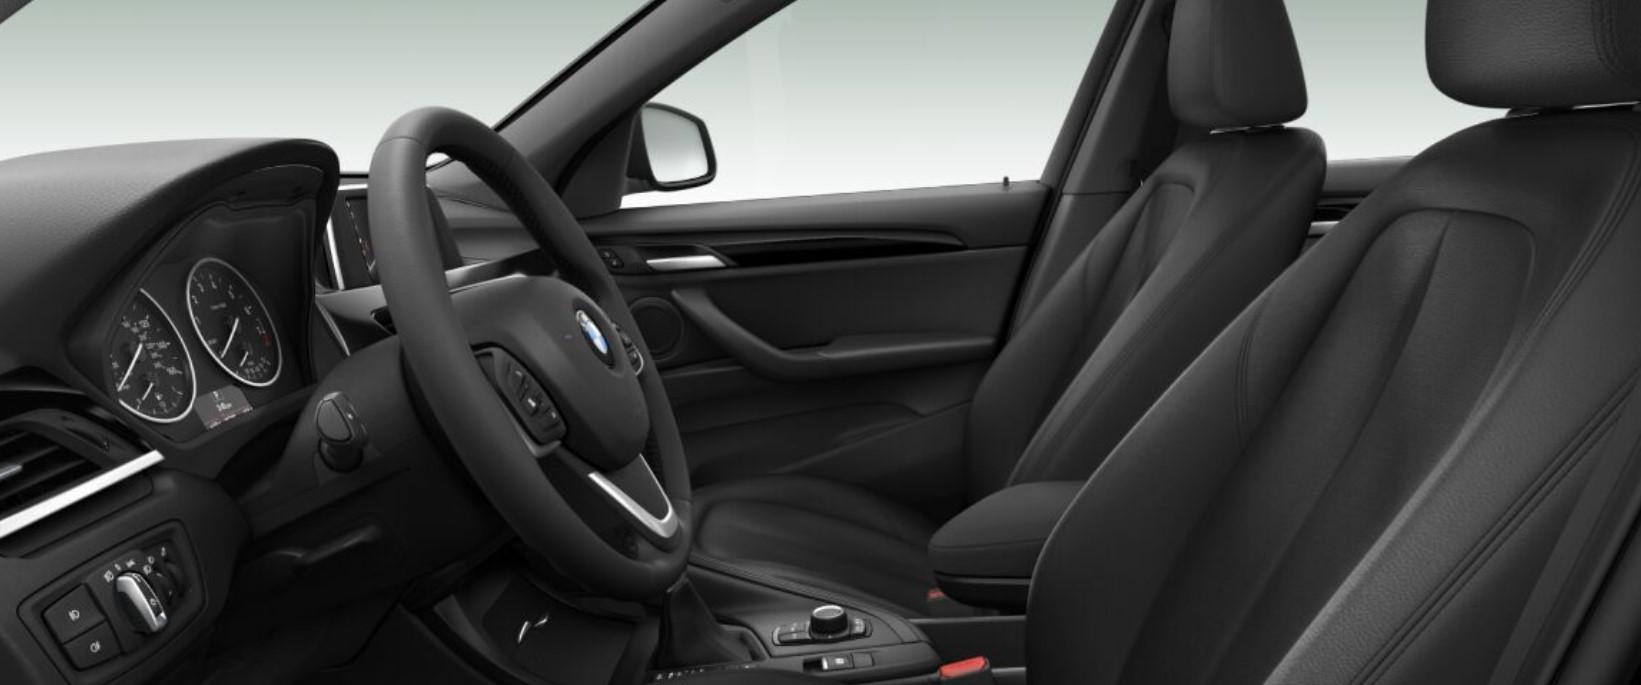 2018 BMW X1 Black Leather Interior